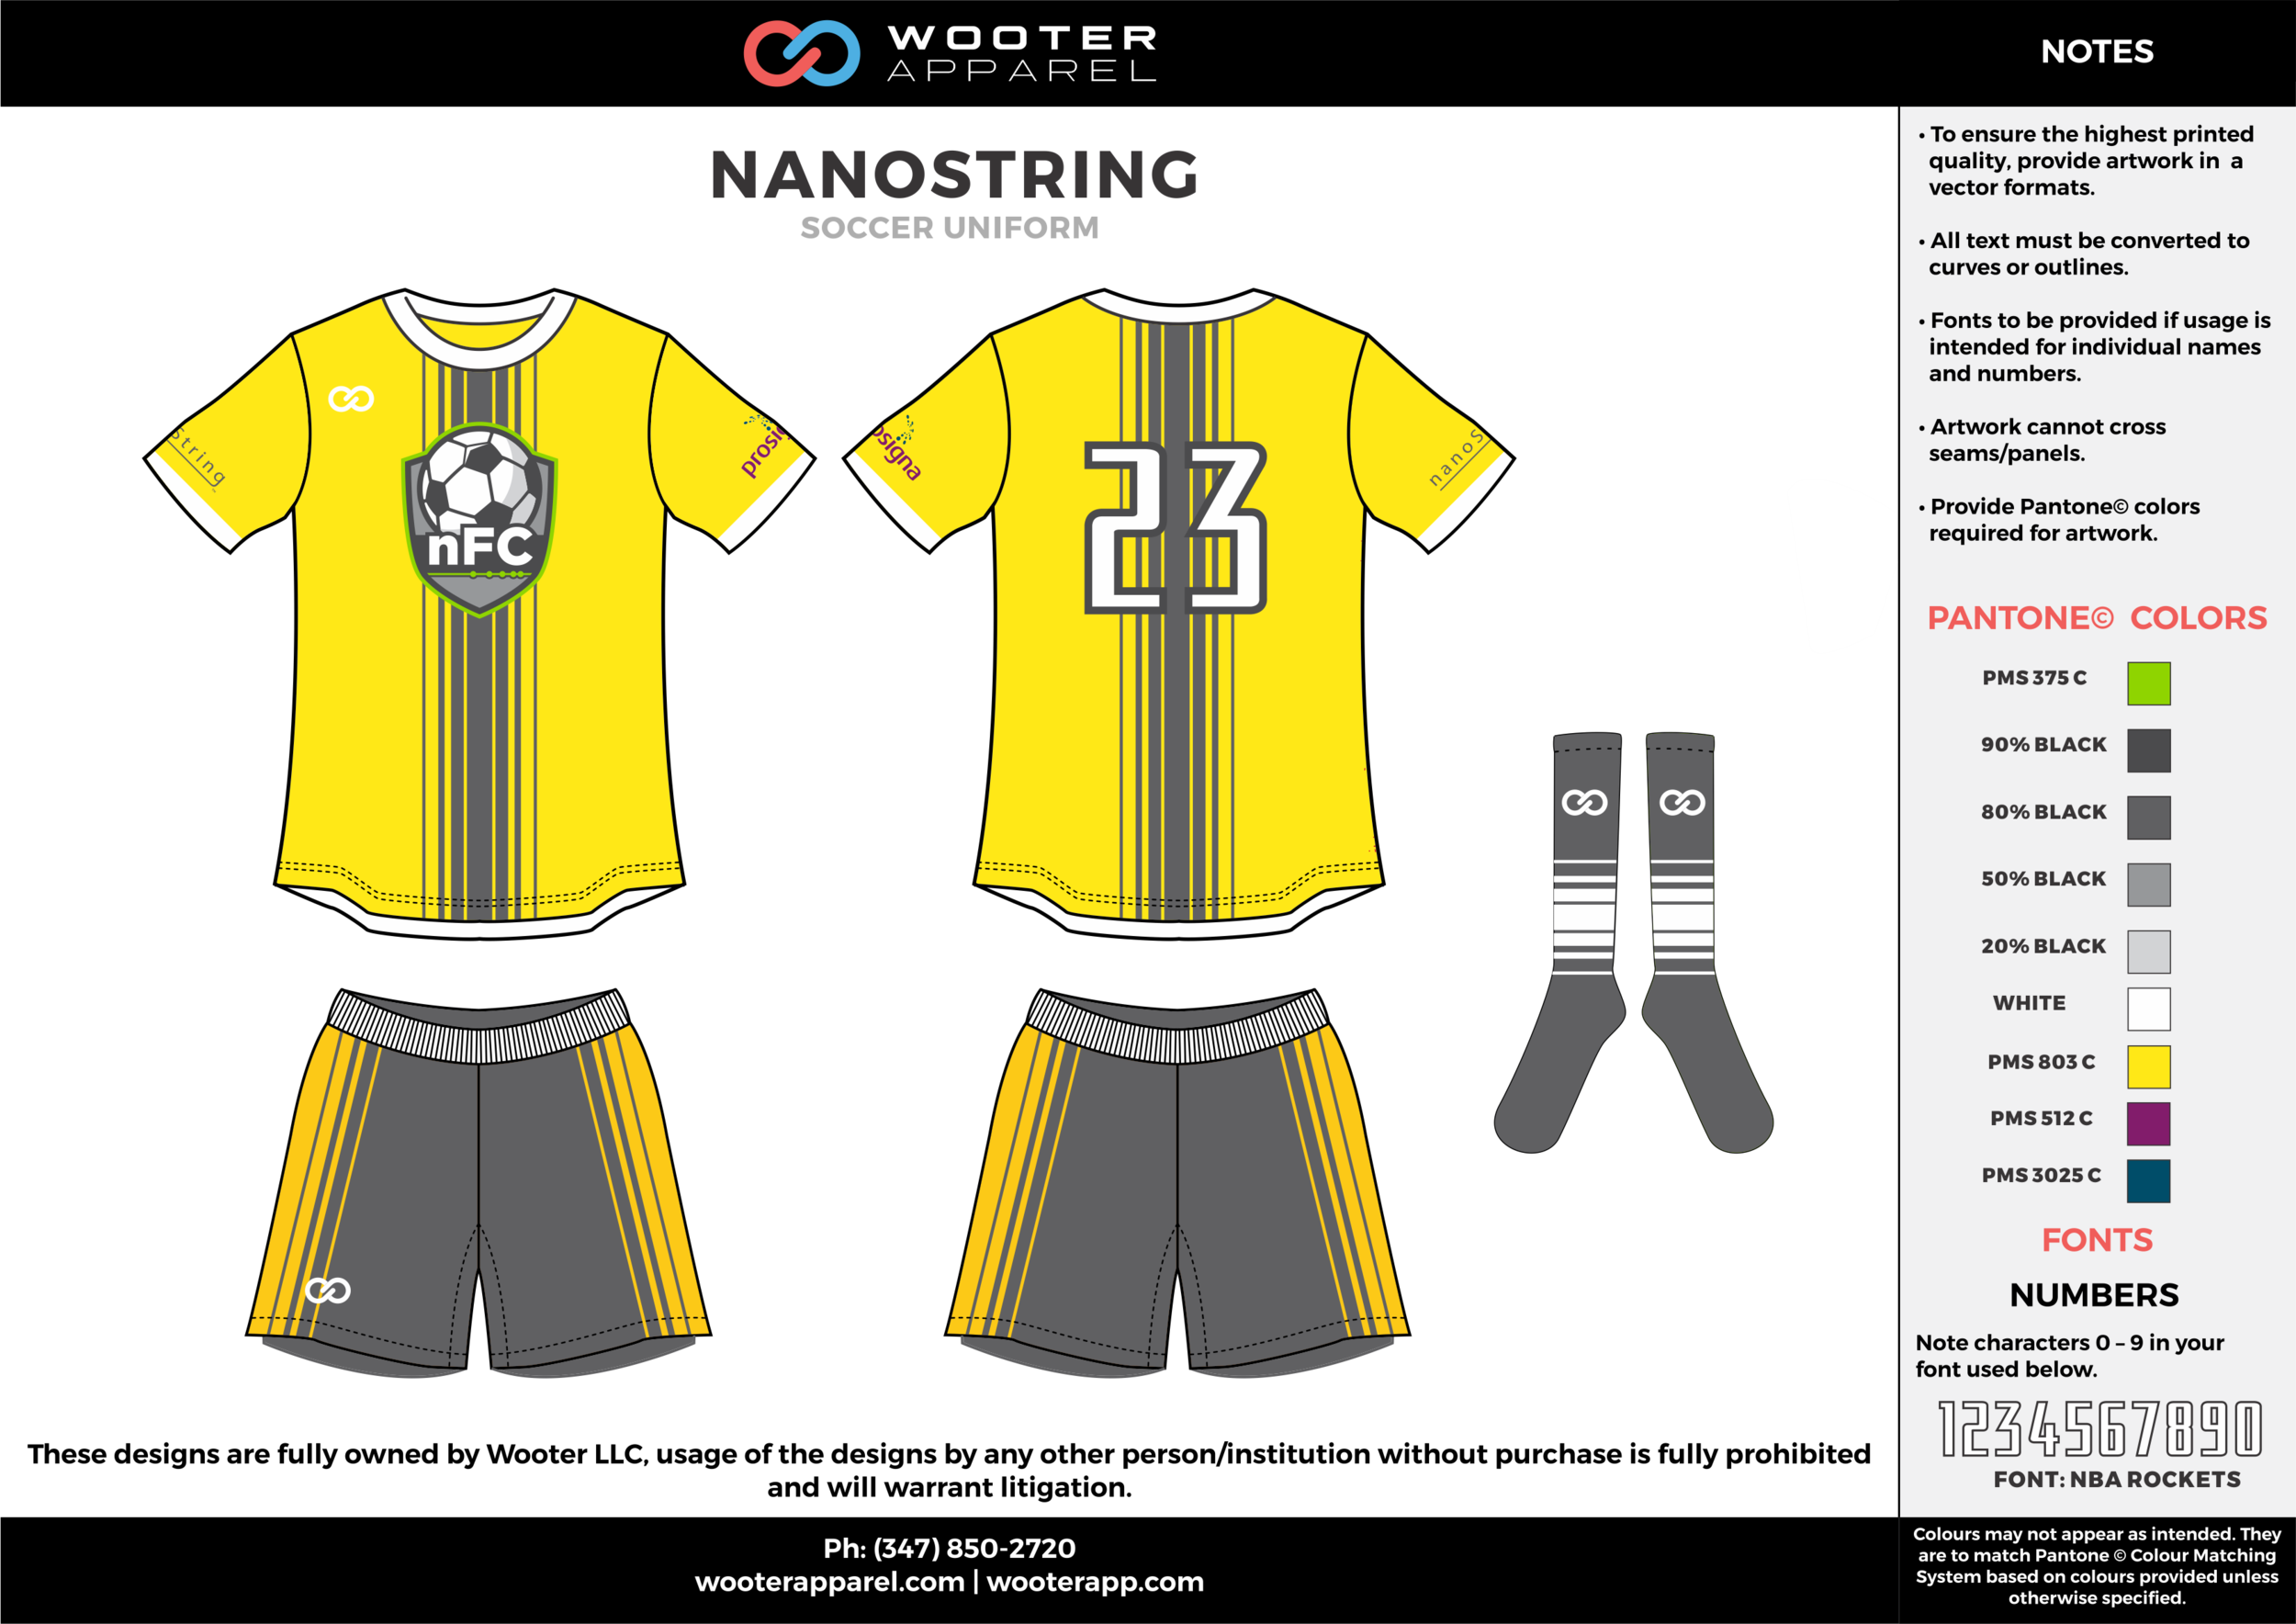 NANOSTRING yellow gray white custom sublimated soccer uniform jersey shirt shorts socks